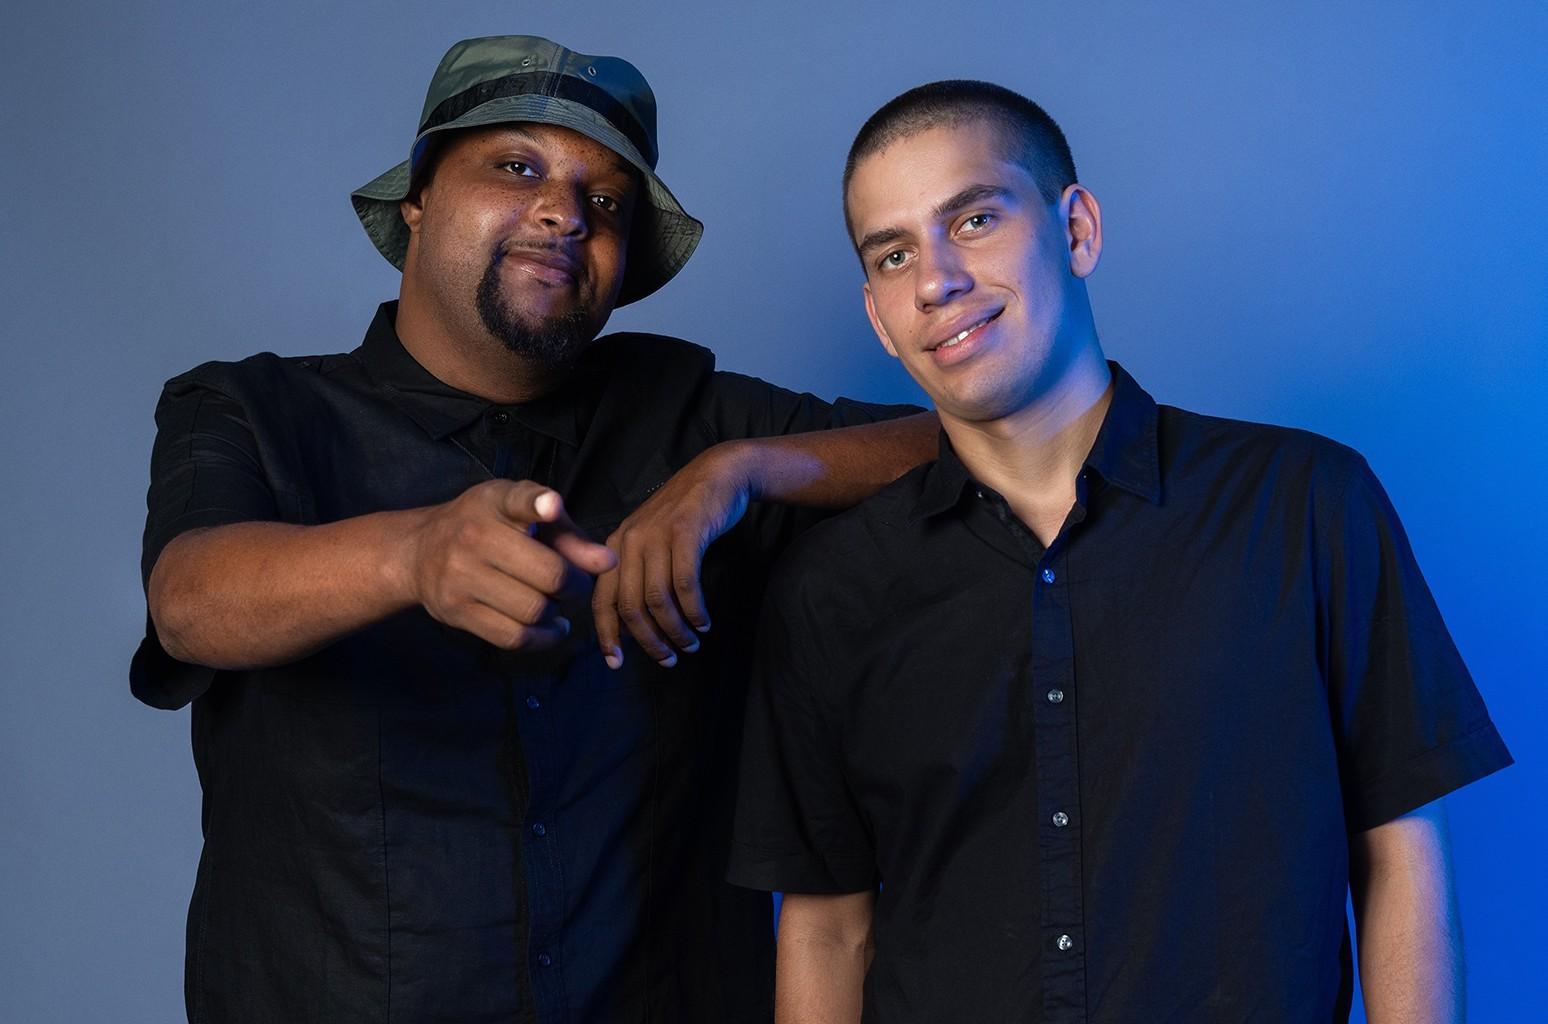 Jamil Davis and Matt Geffen